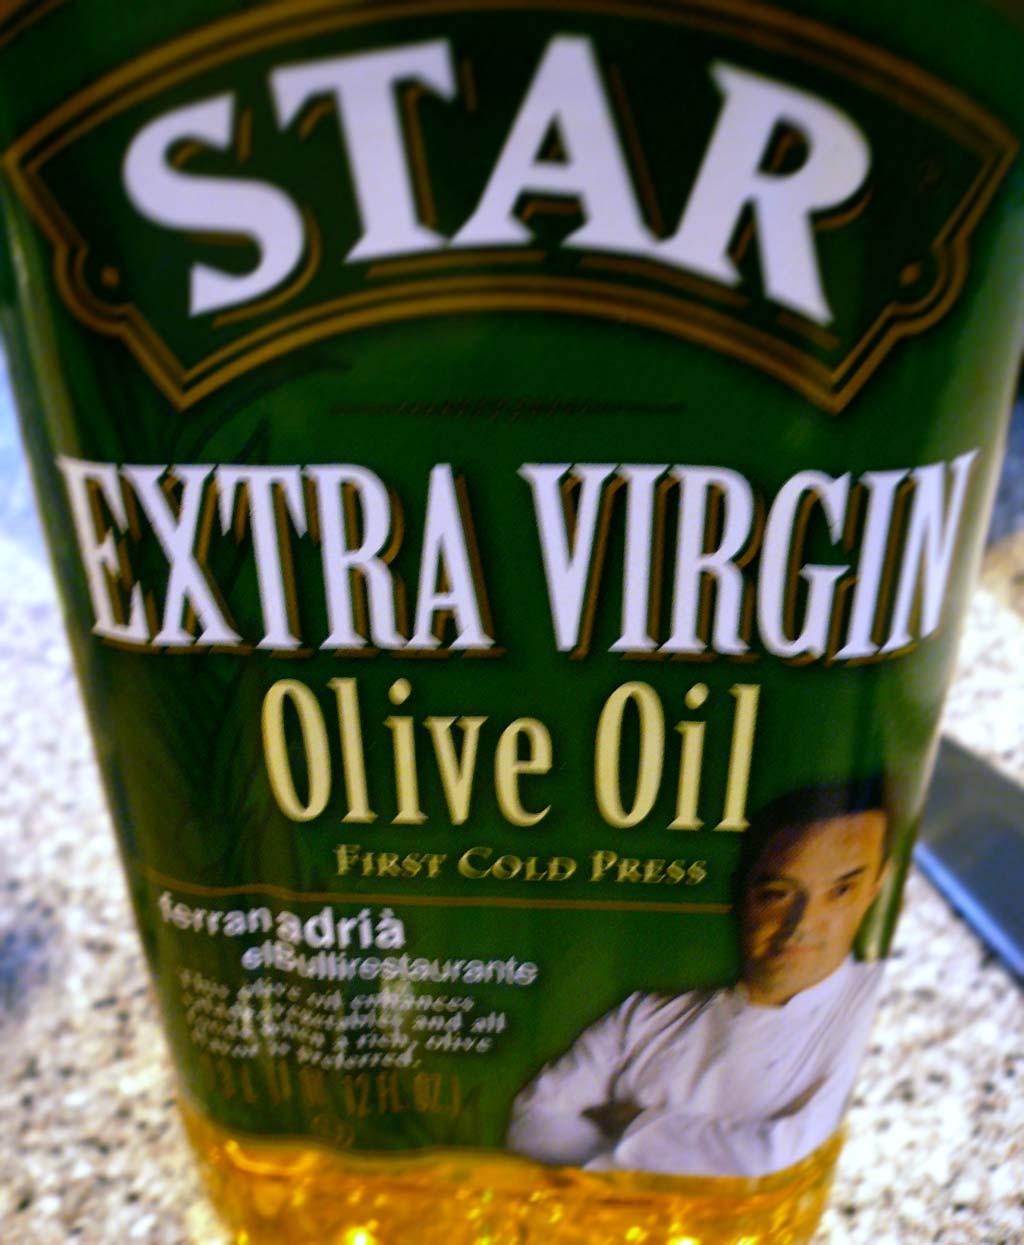 Star Brand EVOO is endorsed by Ferran Adria